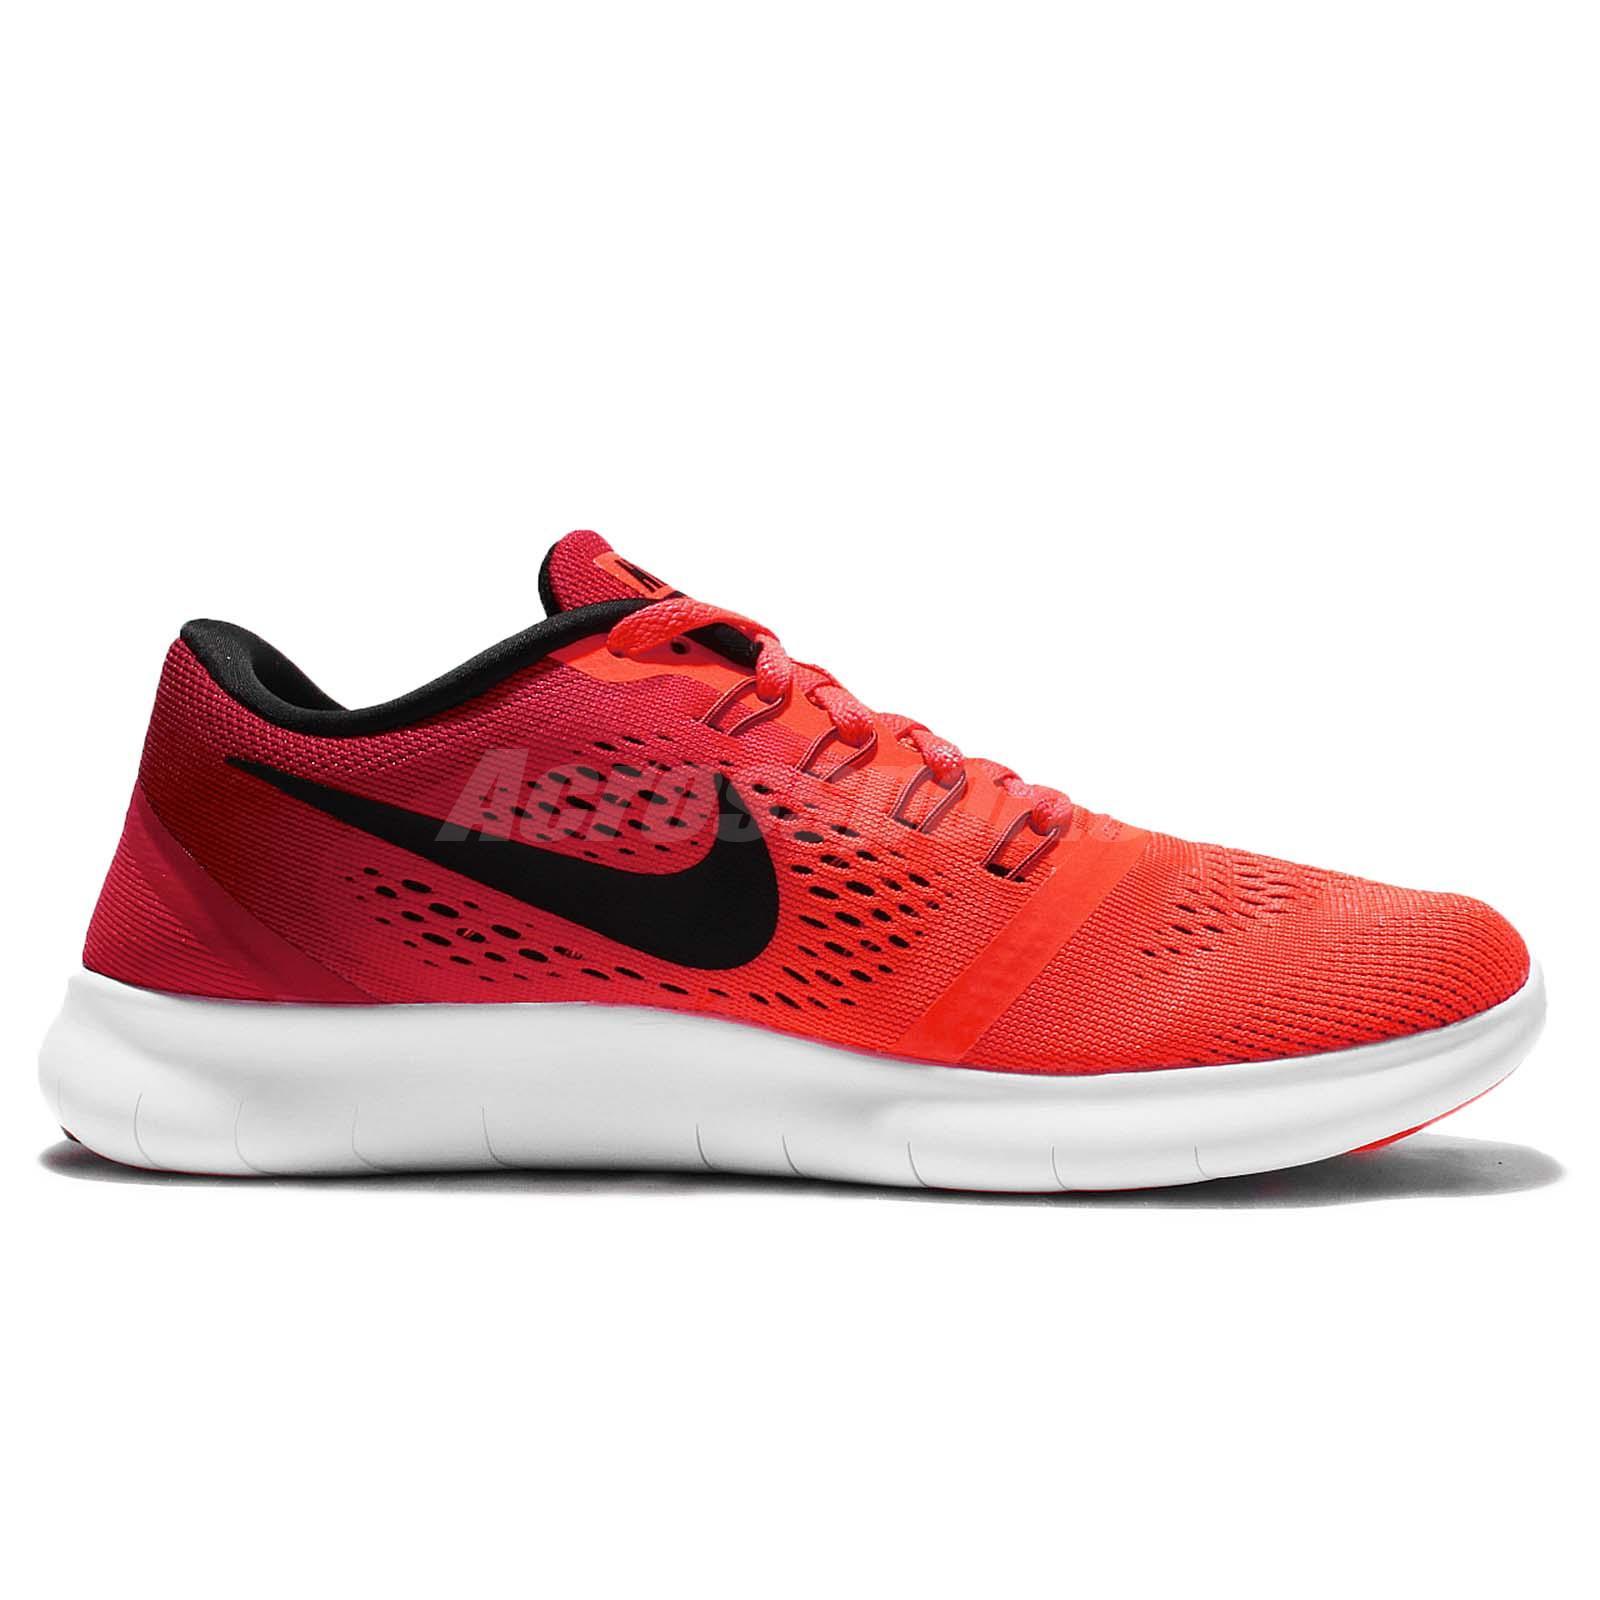 Wmns Nike Free RN Run Red Black Womens Running Shoes Sneakers Runner ... 852e4b60e